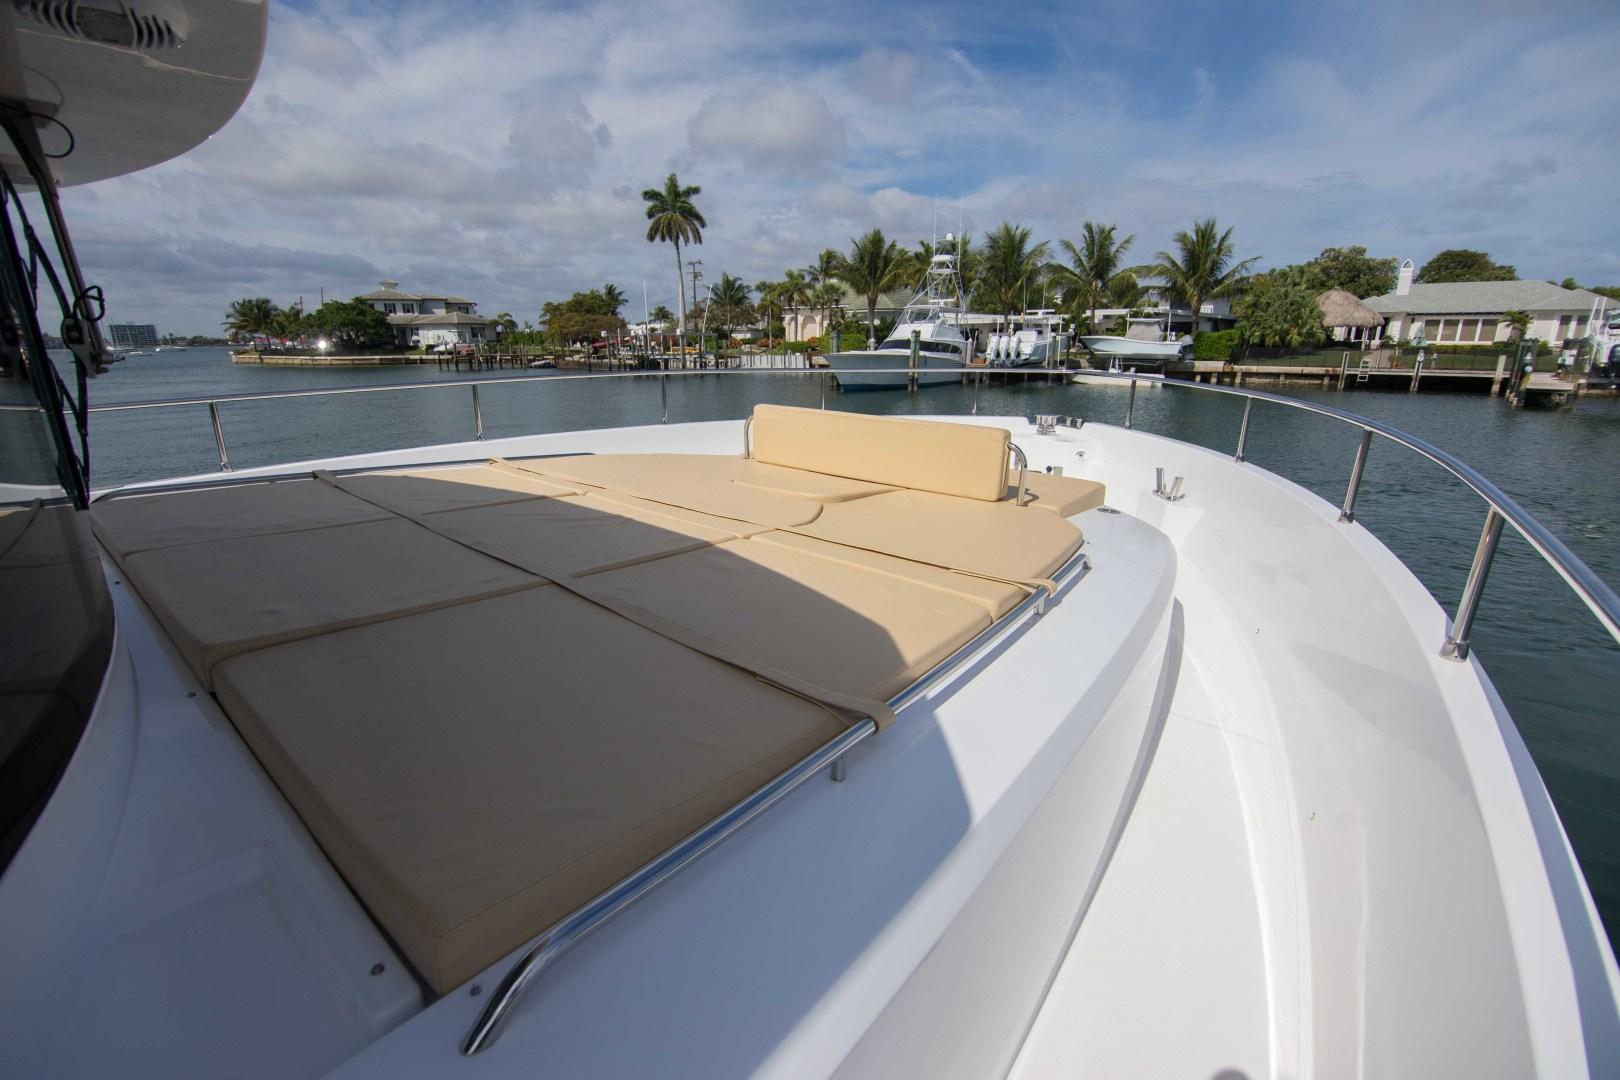 Sundeck-58 Sport 2019-LJ IV Singer Island-Florida-United States-Bow-1373096 | Thumbnail